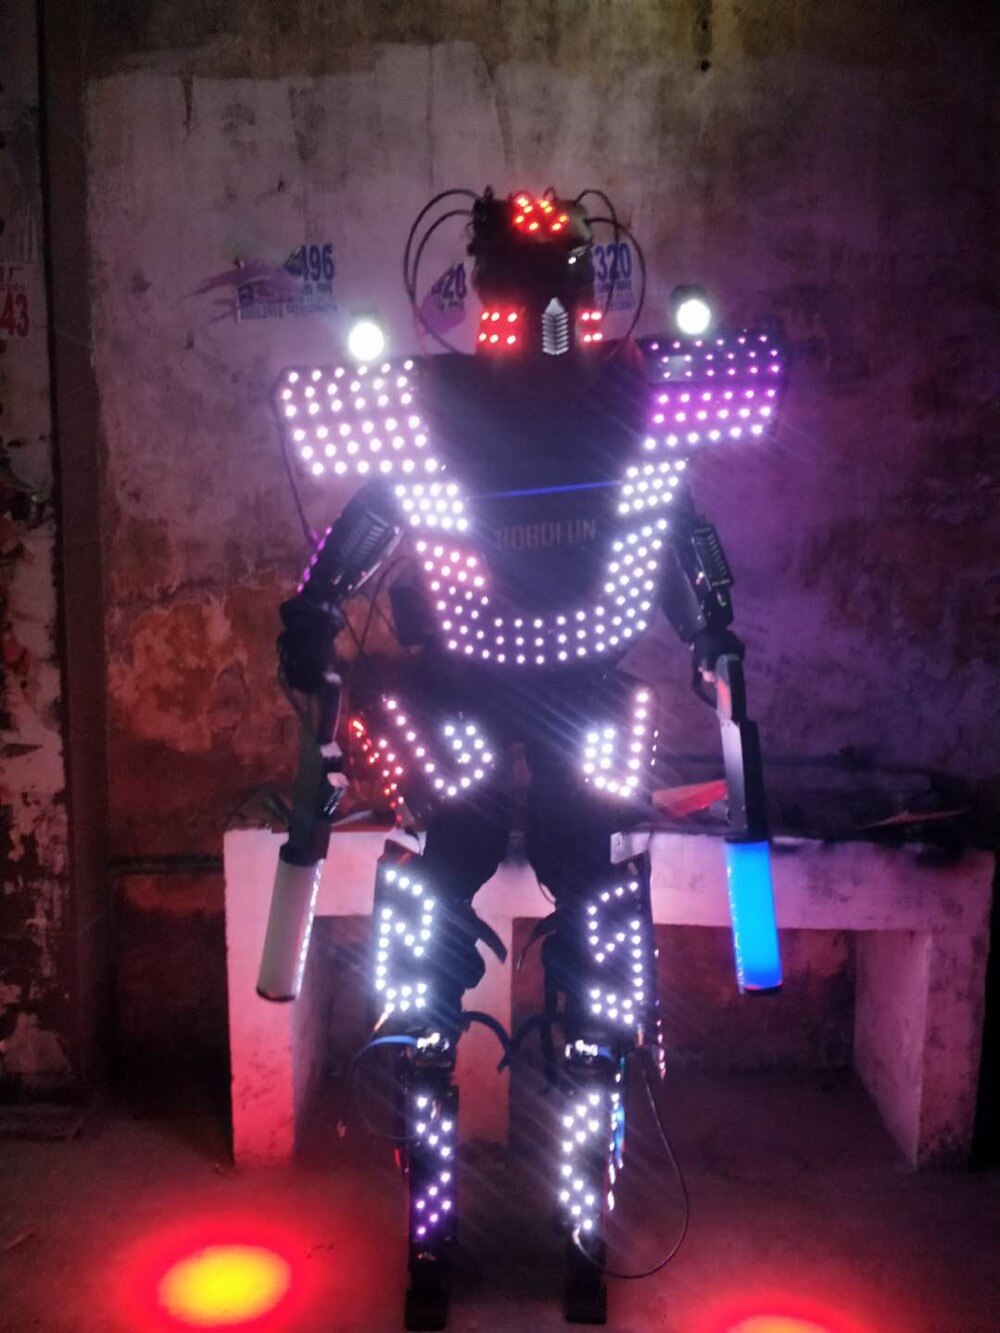 (Without Gun) LED robot suit colorful luminous glowing wears dancing costumes model show dress clothe dj bar performance